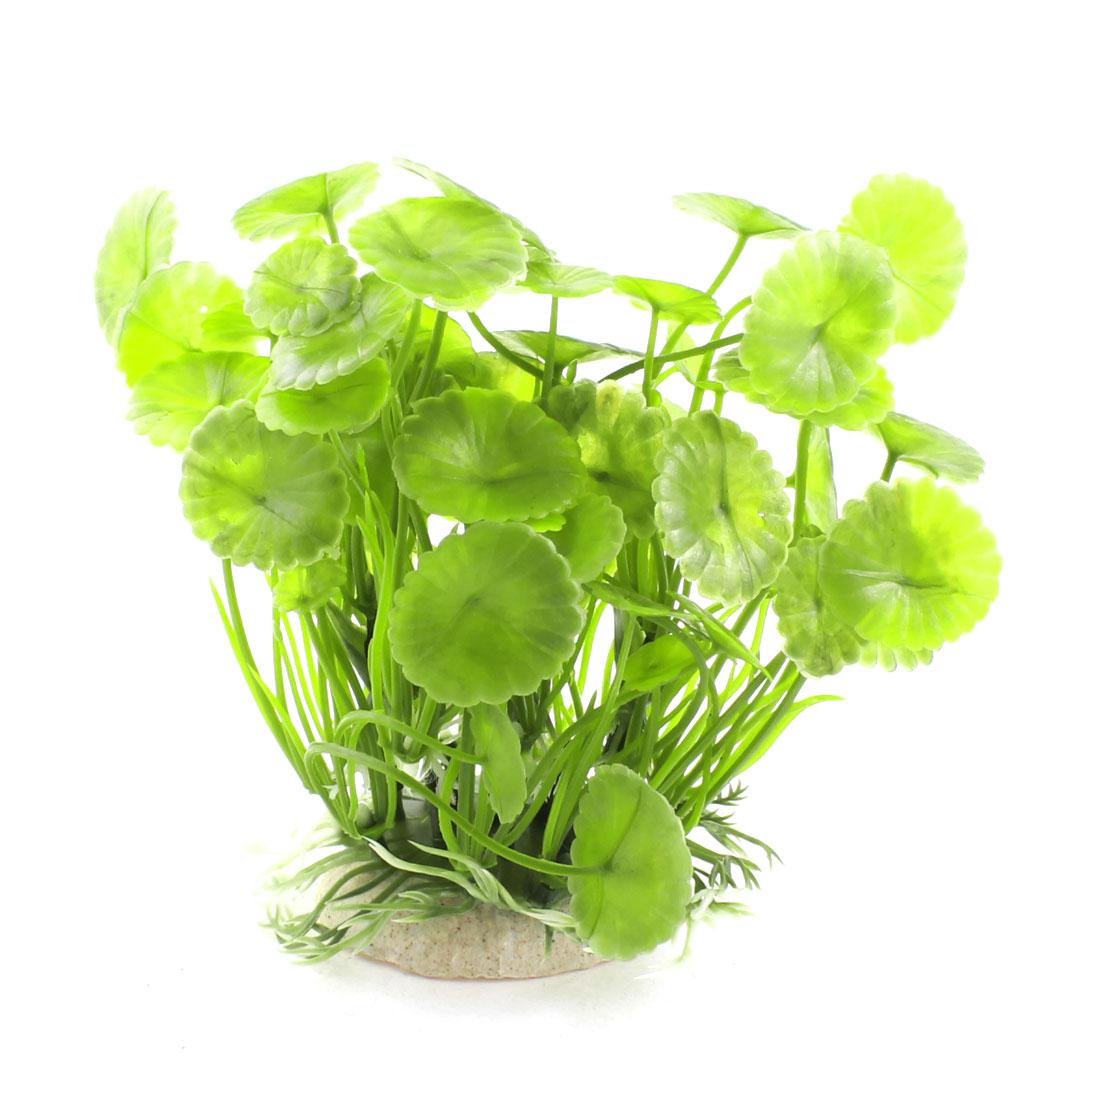 "Fish Tank Aquarium Green Plastic Manmade Water Plants Ornament Decor 4.7"" Height"